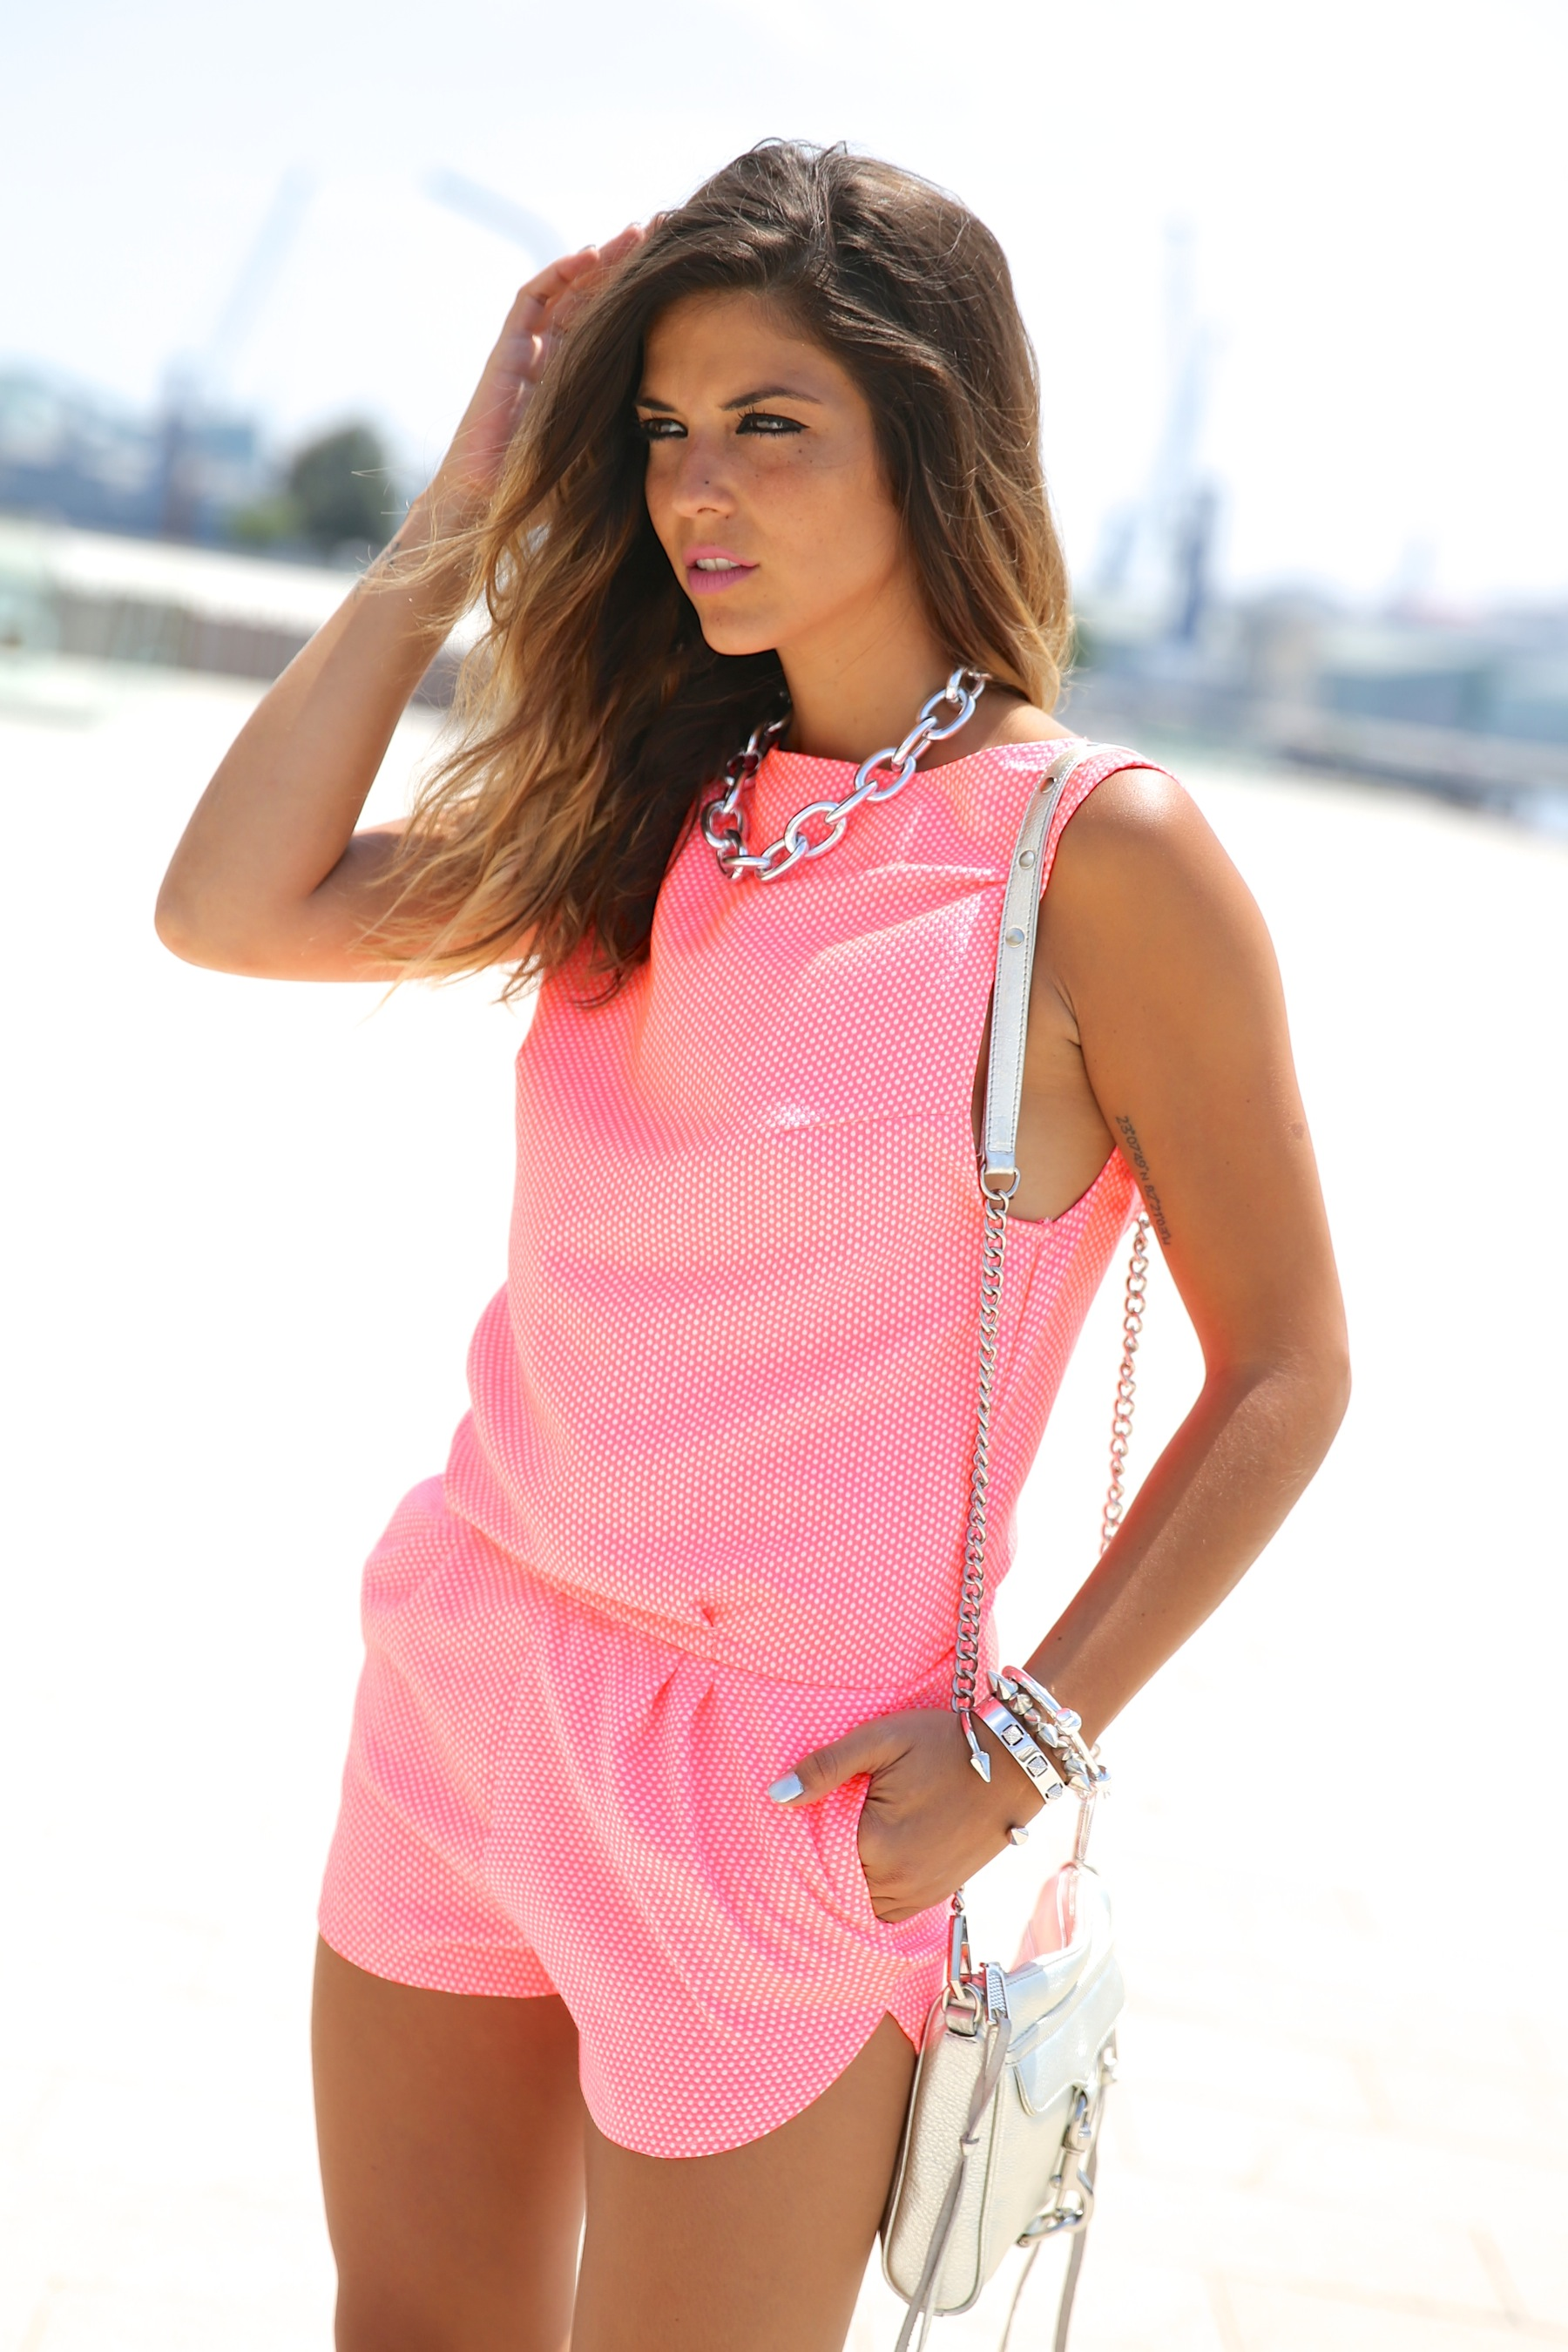 trendy_taste-look-outfit-street_style-ootd-blog-blogger-fashion_spain-moda_españa-silver_bag-bolso_plata-mono_rosa-mekdes-coruña-marina-7